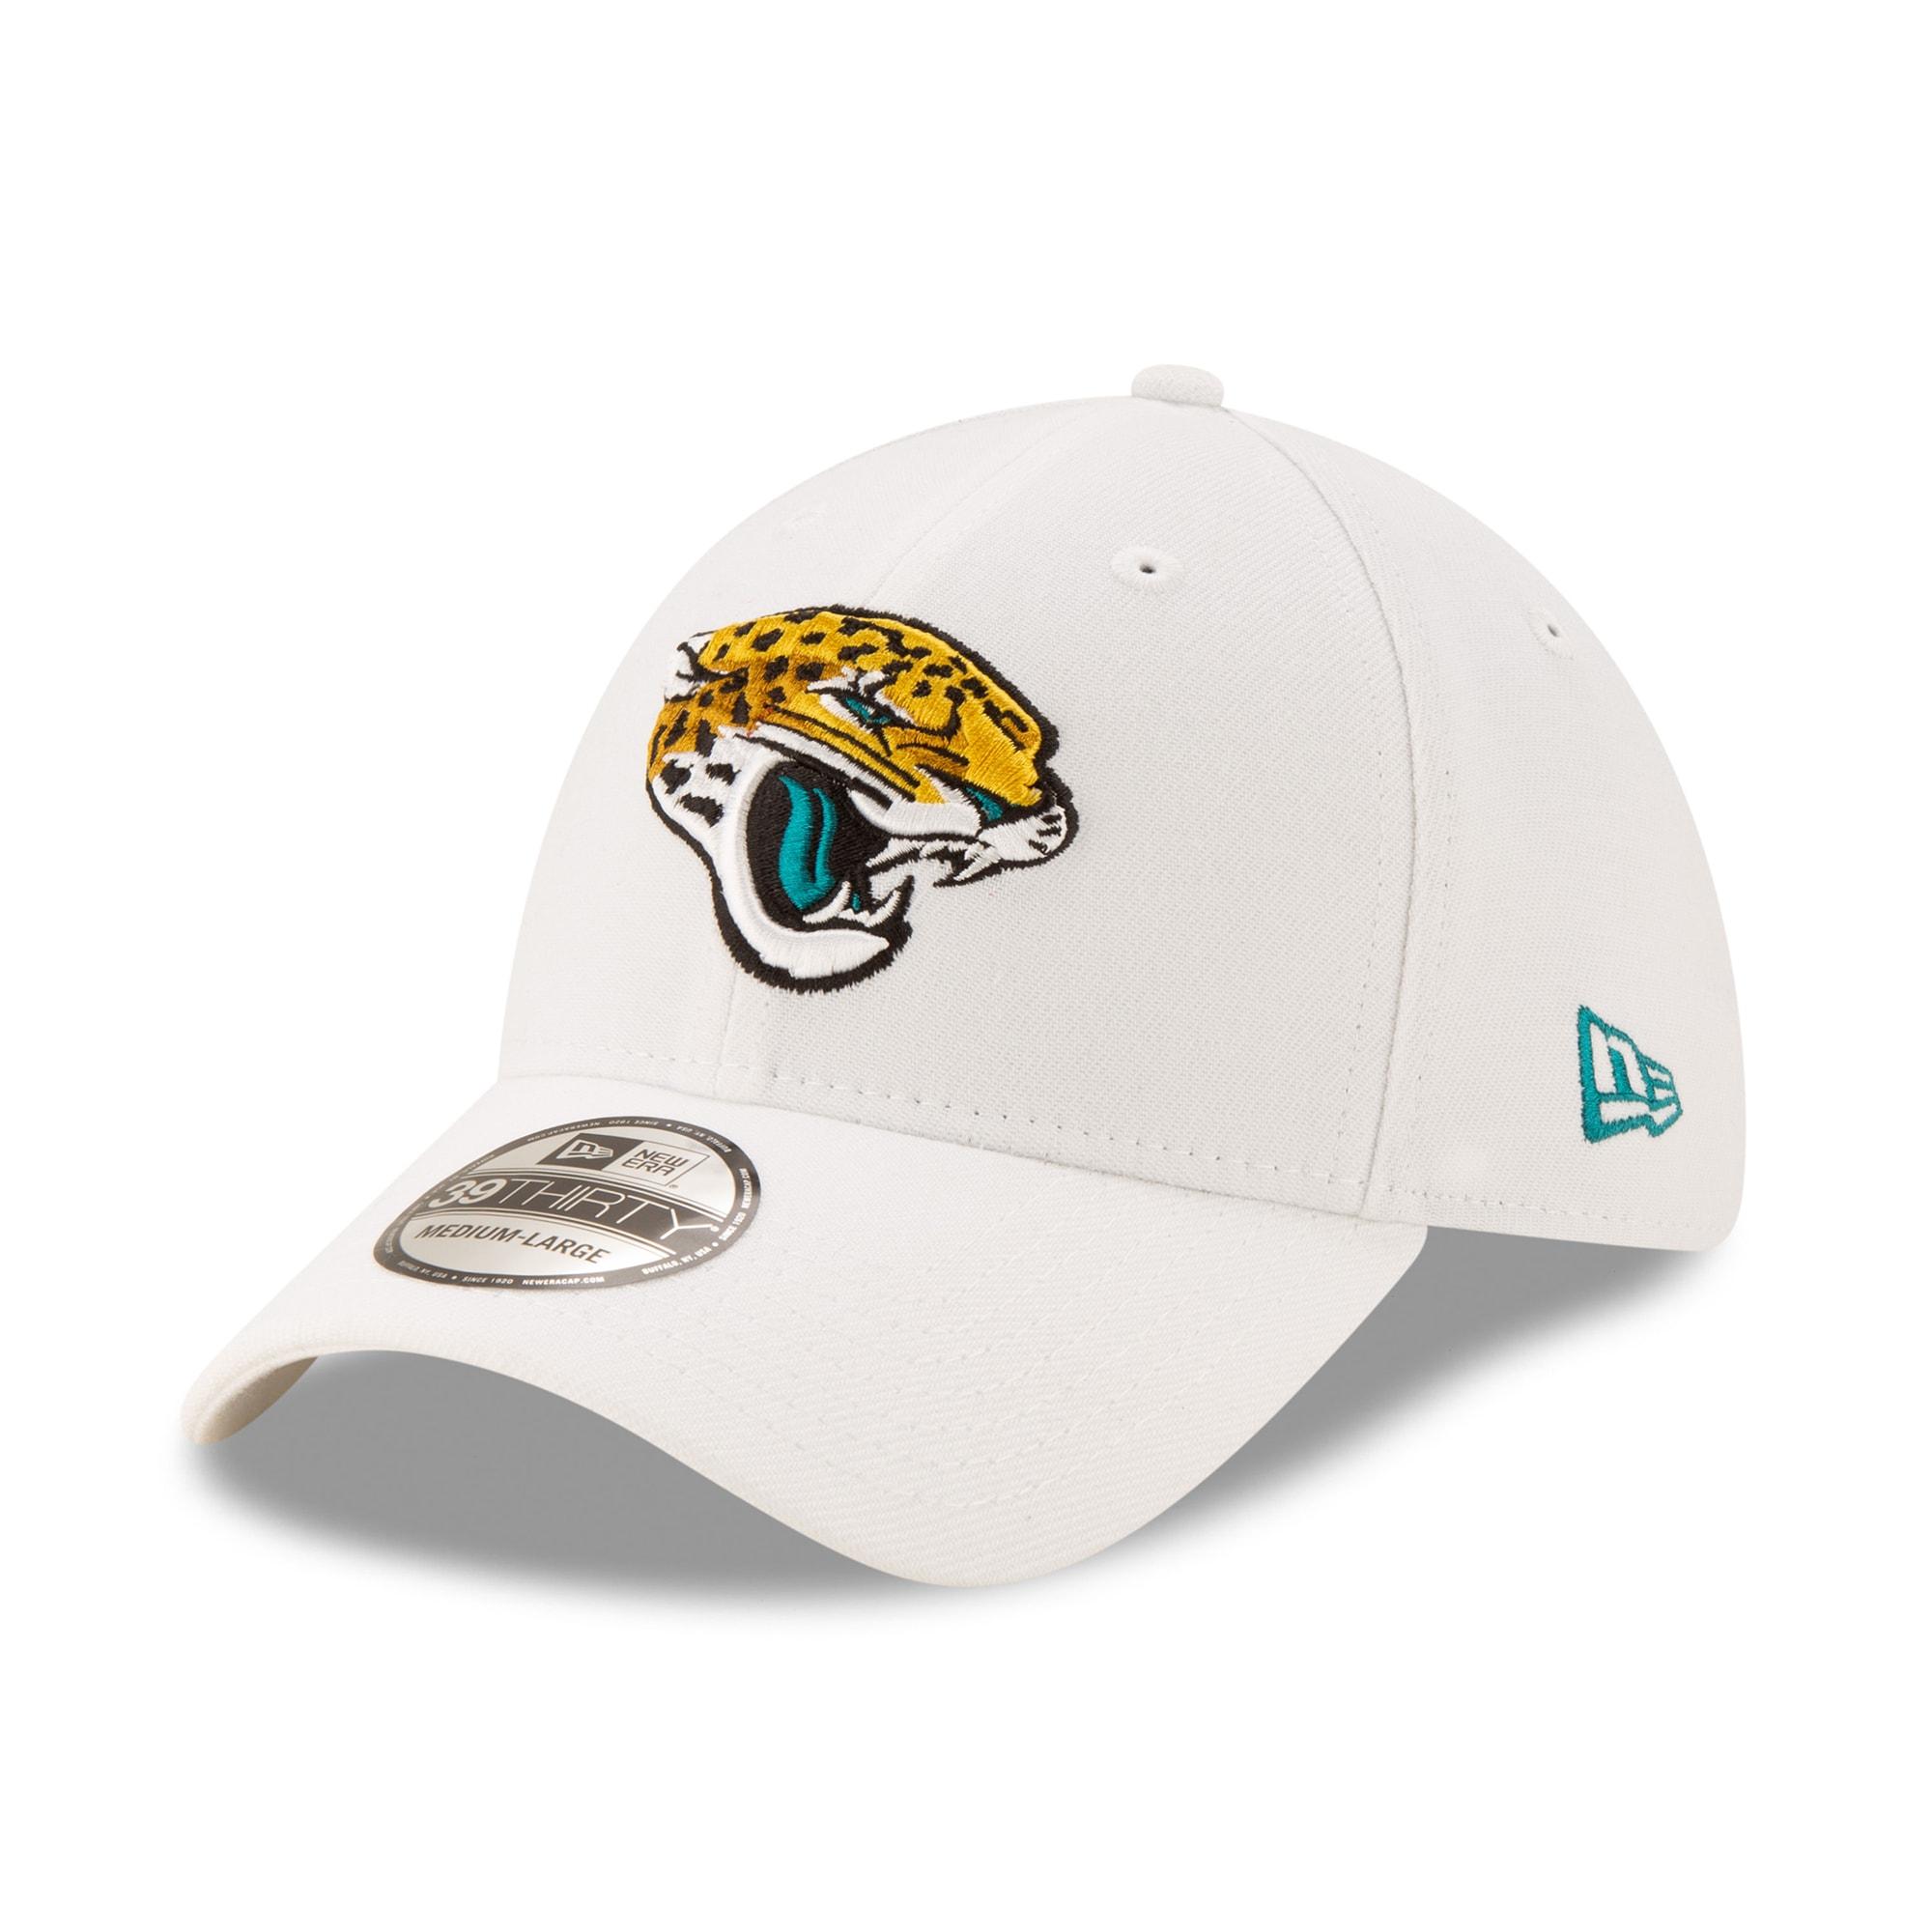 Jacksonville Jaguars New Era Iced 39THIRTY Flex Hat - White